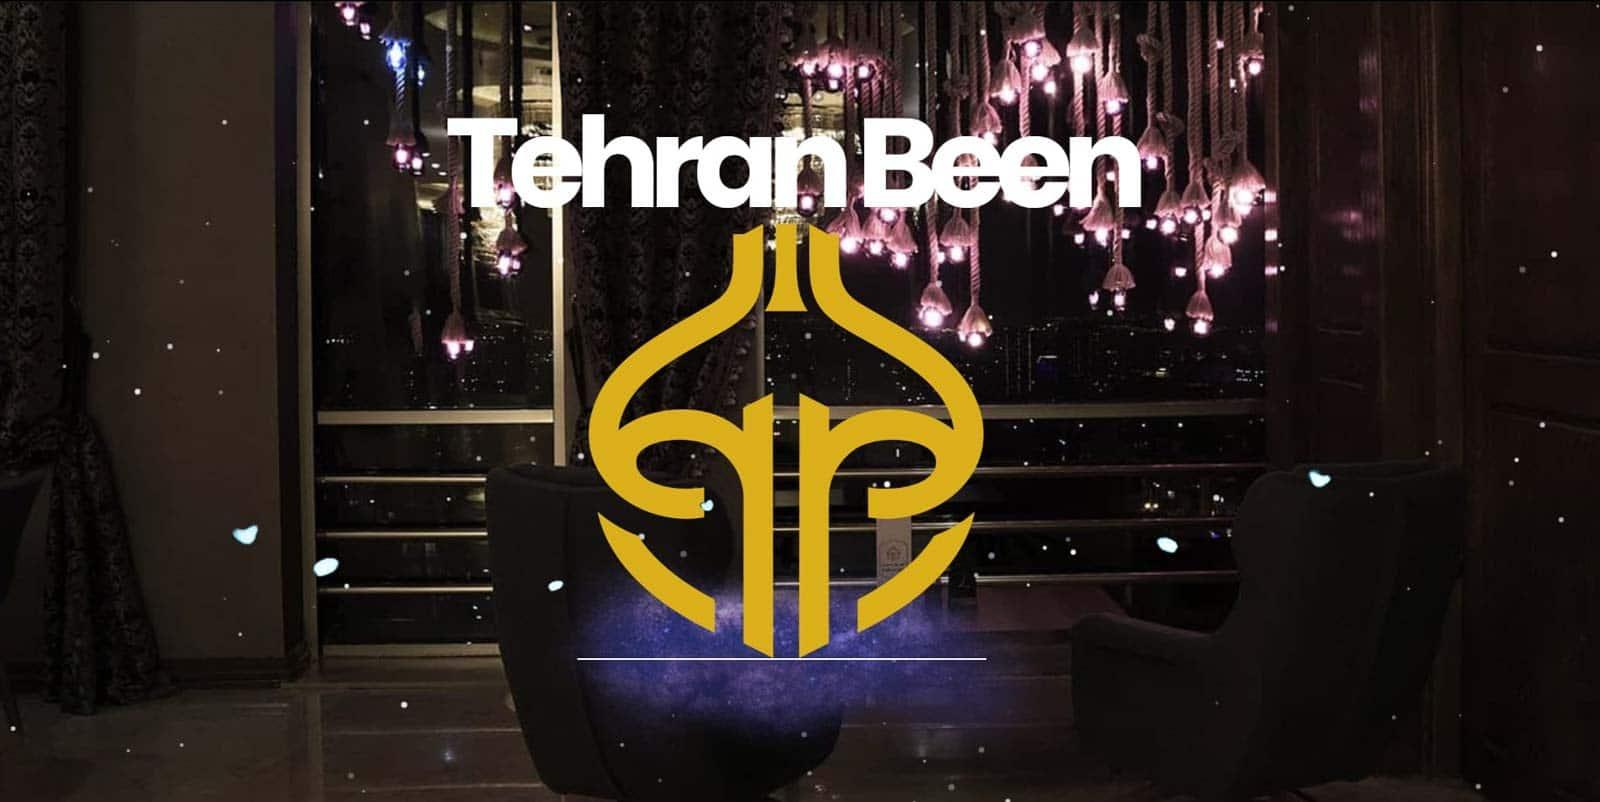 کافه و رستوران تهران بین